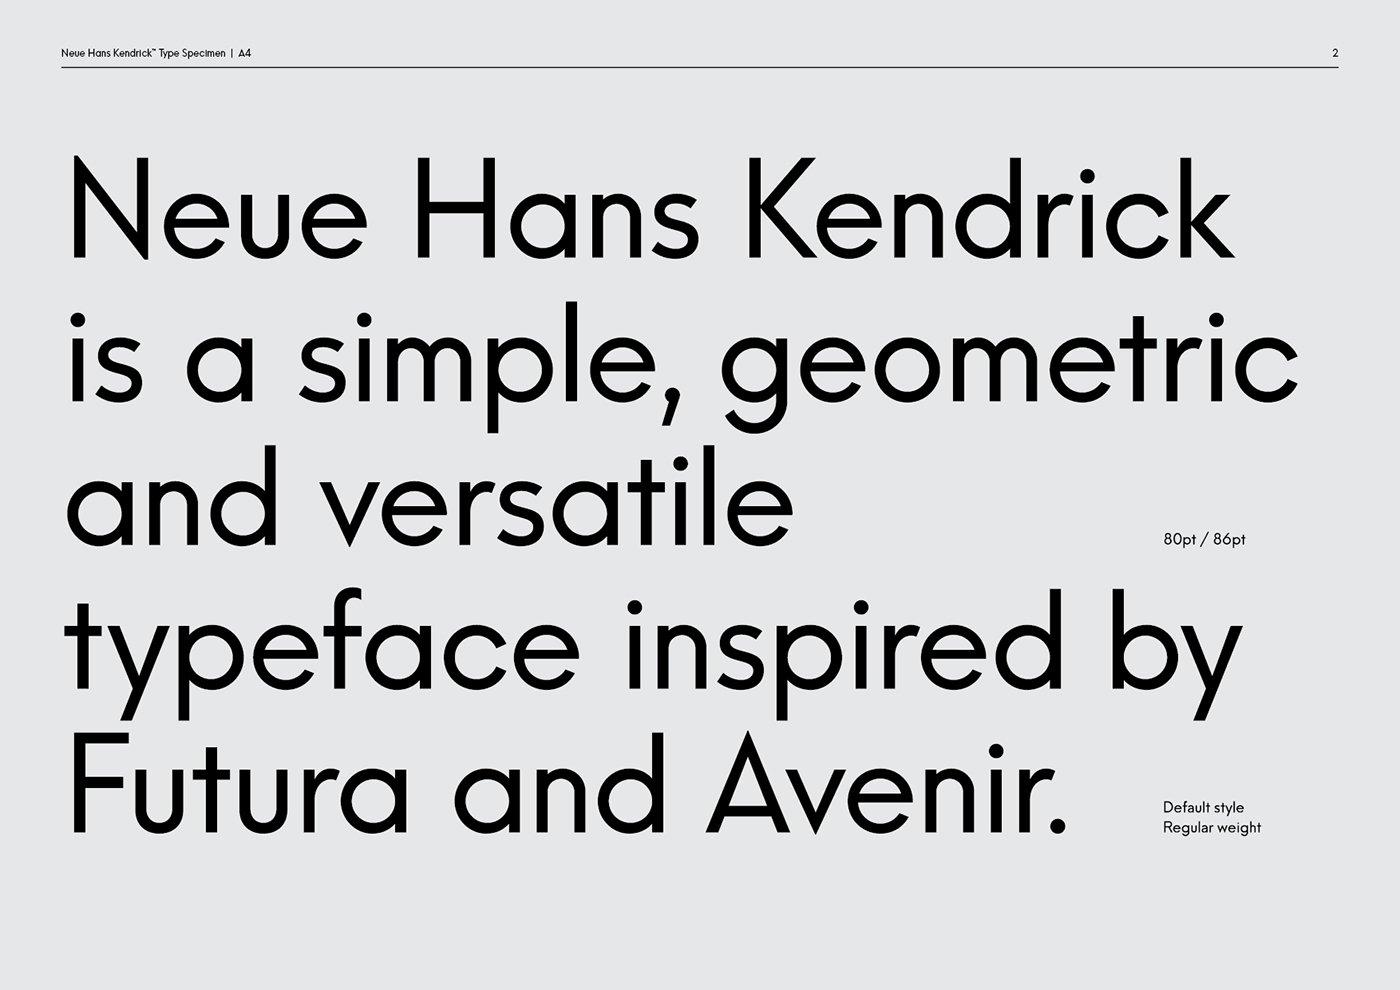 neue-hans-kendrick-1